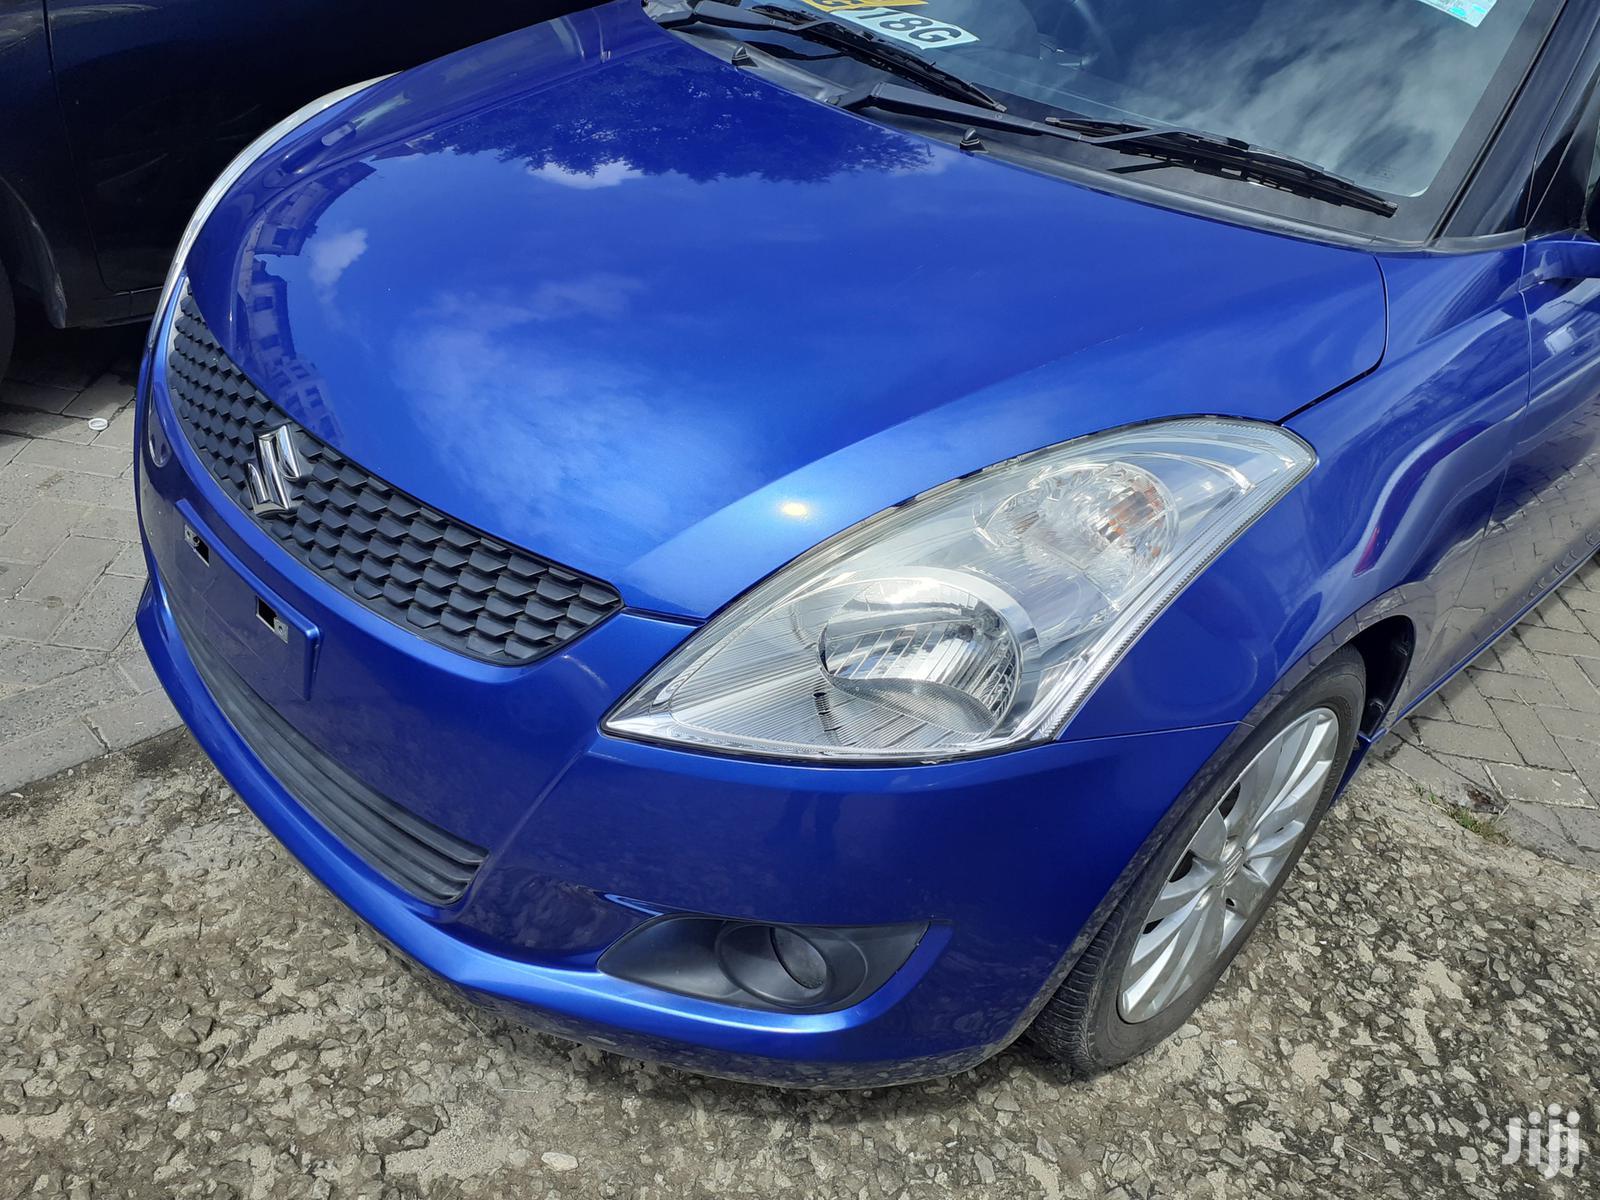 Suzuki Swift 2012 1.4 Blue | Cars for sale in Moi Avenue, Mombasa, Kenya